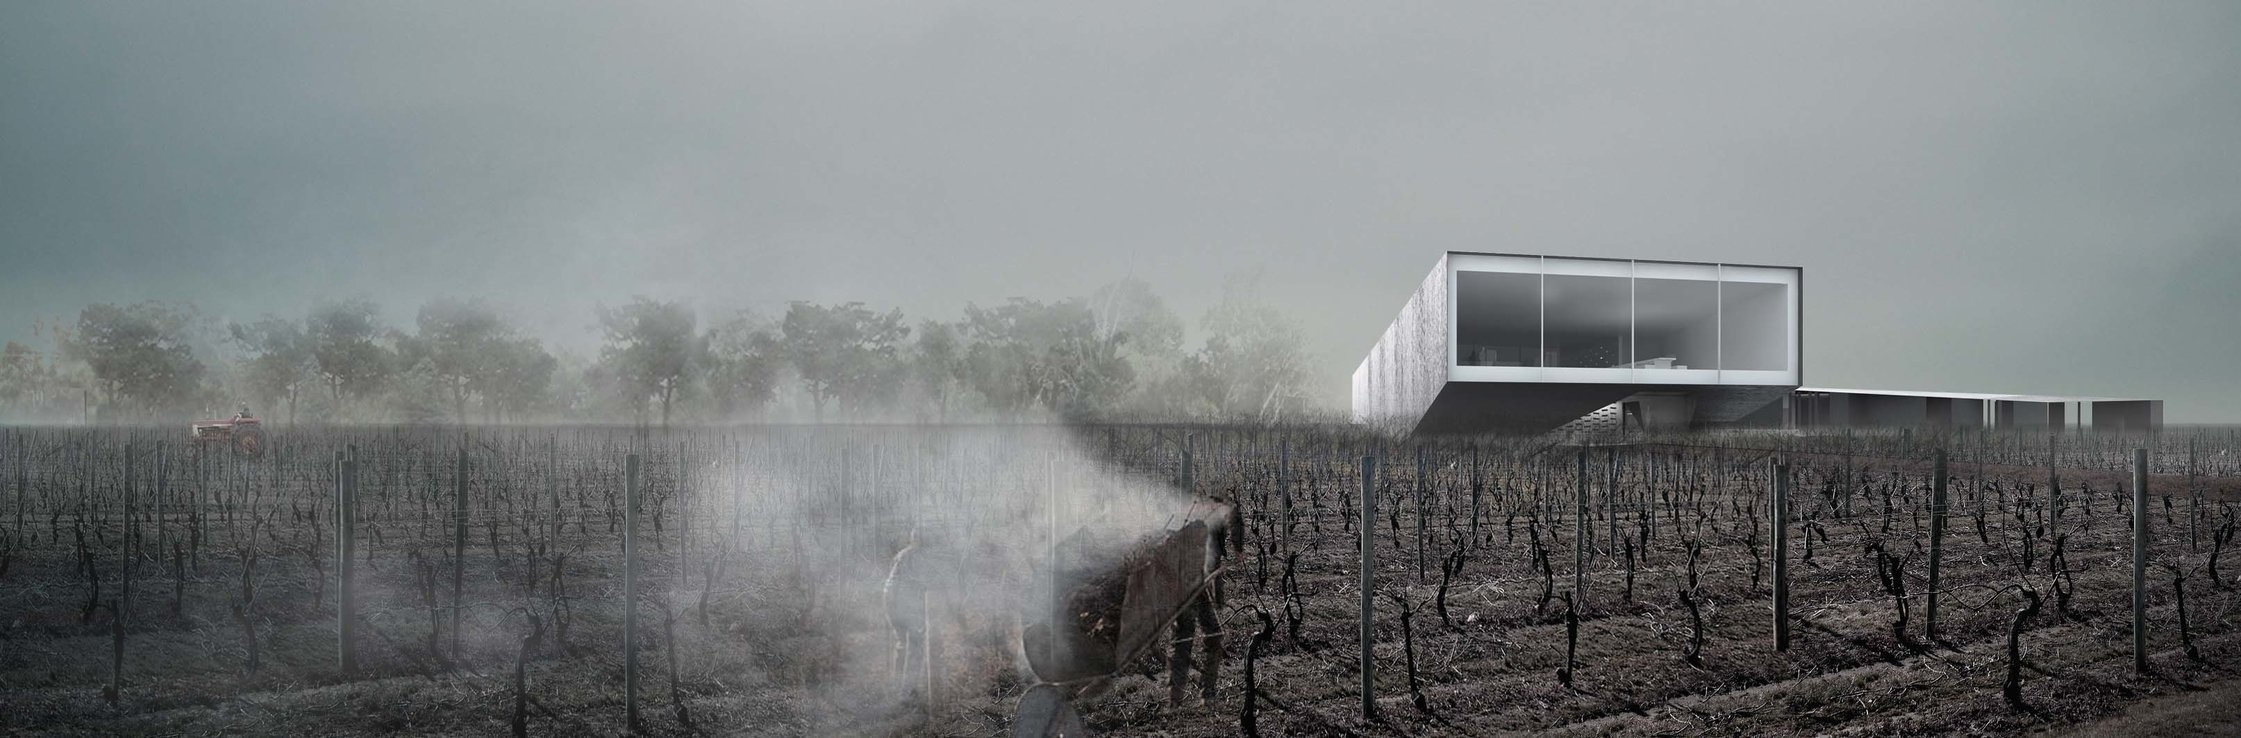 Copy of Copy of Pearl Morrisette Winery - VIneyard Fall fields